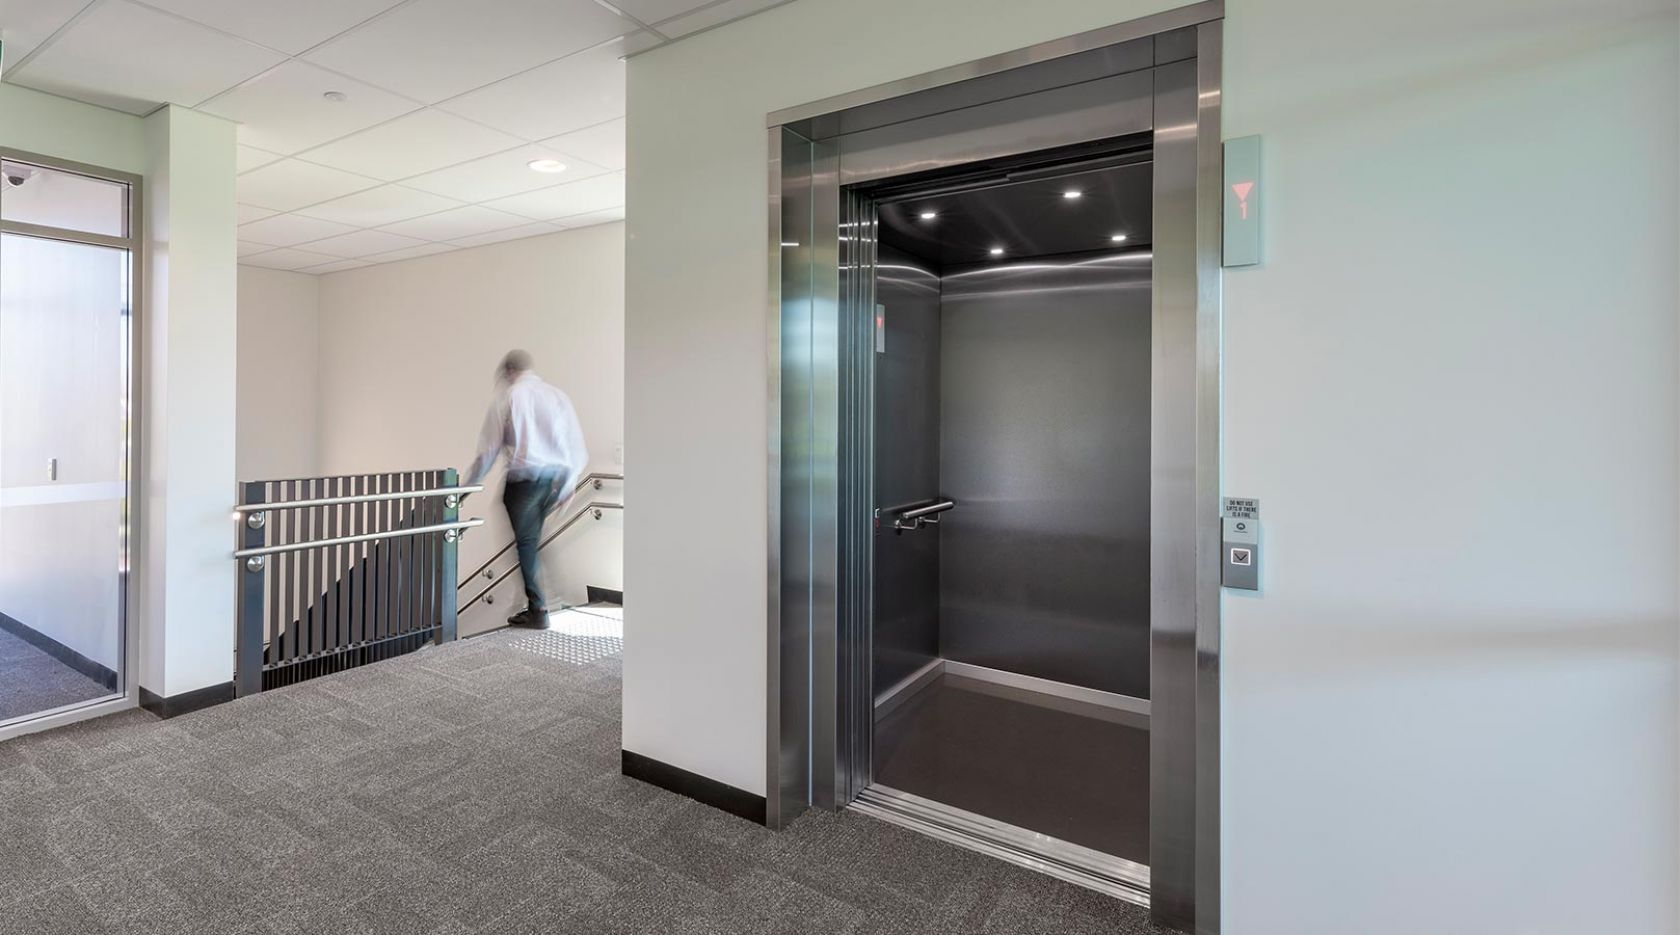 schiavello construction adelaide goodwood oval sport stadium elevator